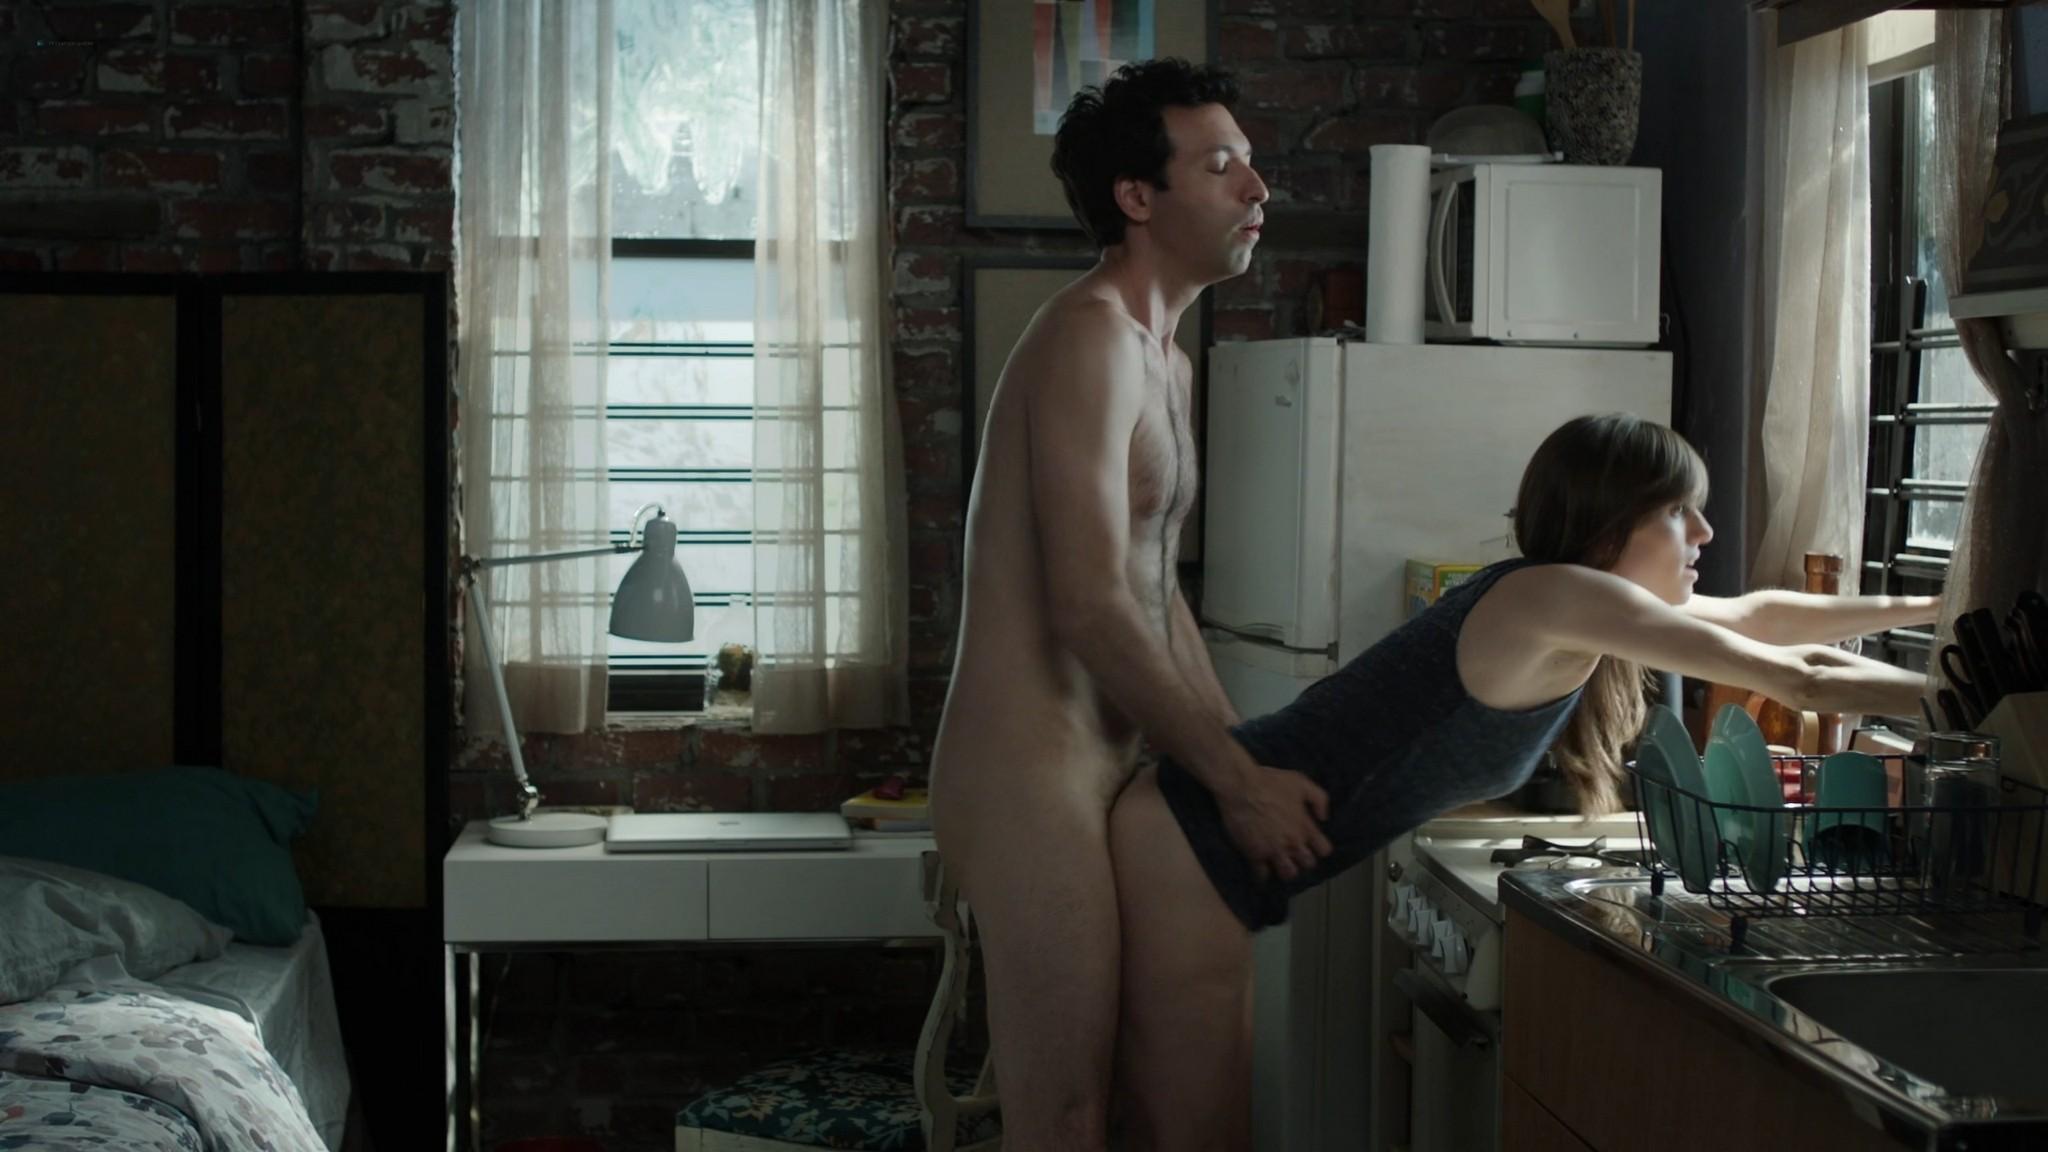 Jemima Kirke nude full frontal Lena Dunham Daisy Eagan nude Allison Williams sexy Girls 2012 s6e1 4 1080p Web 13